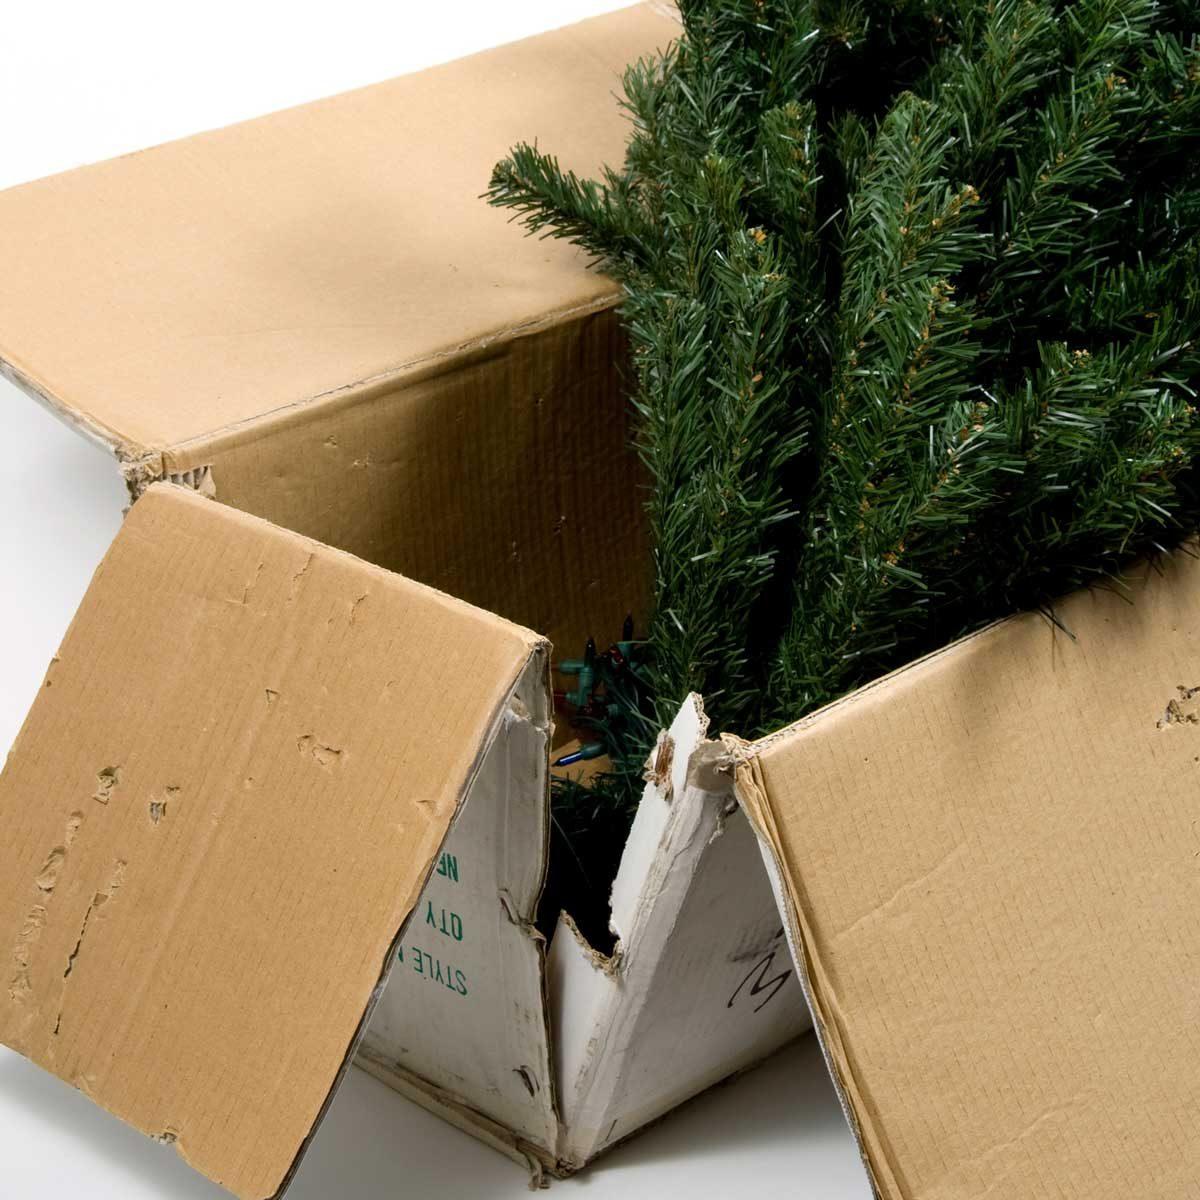 4 Ways To Store Christmas Trees Family Handyman